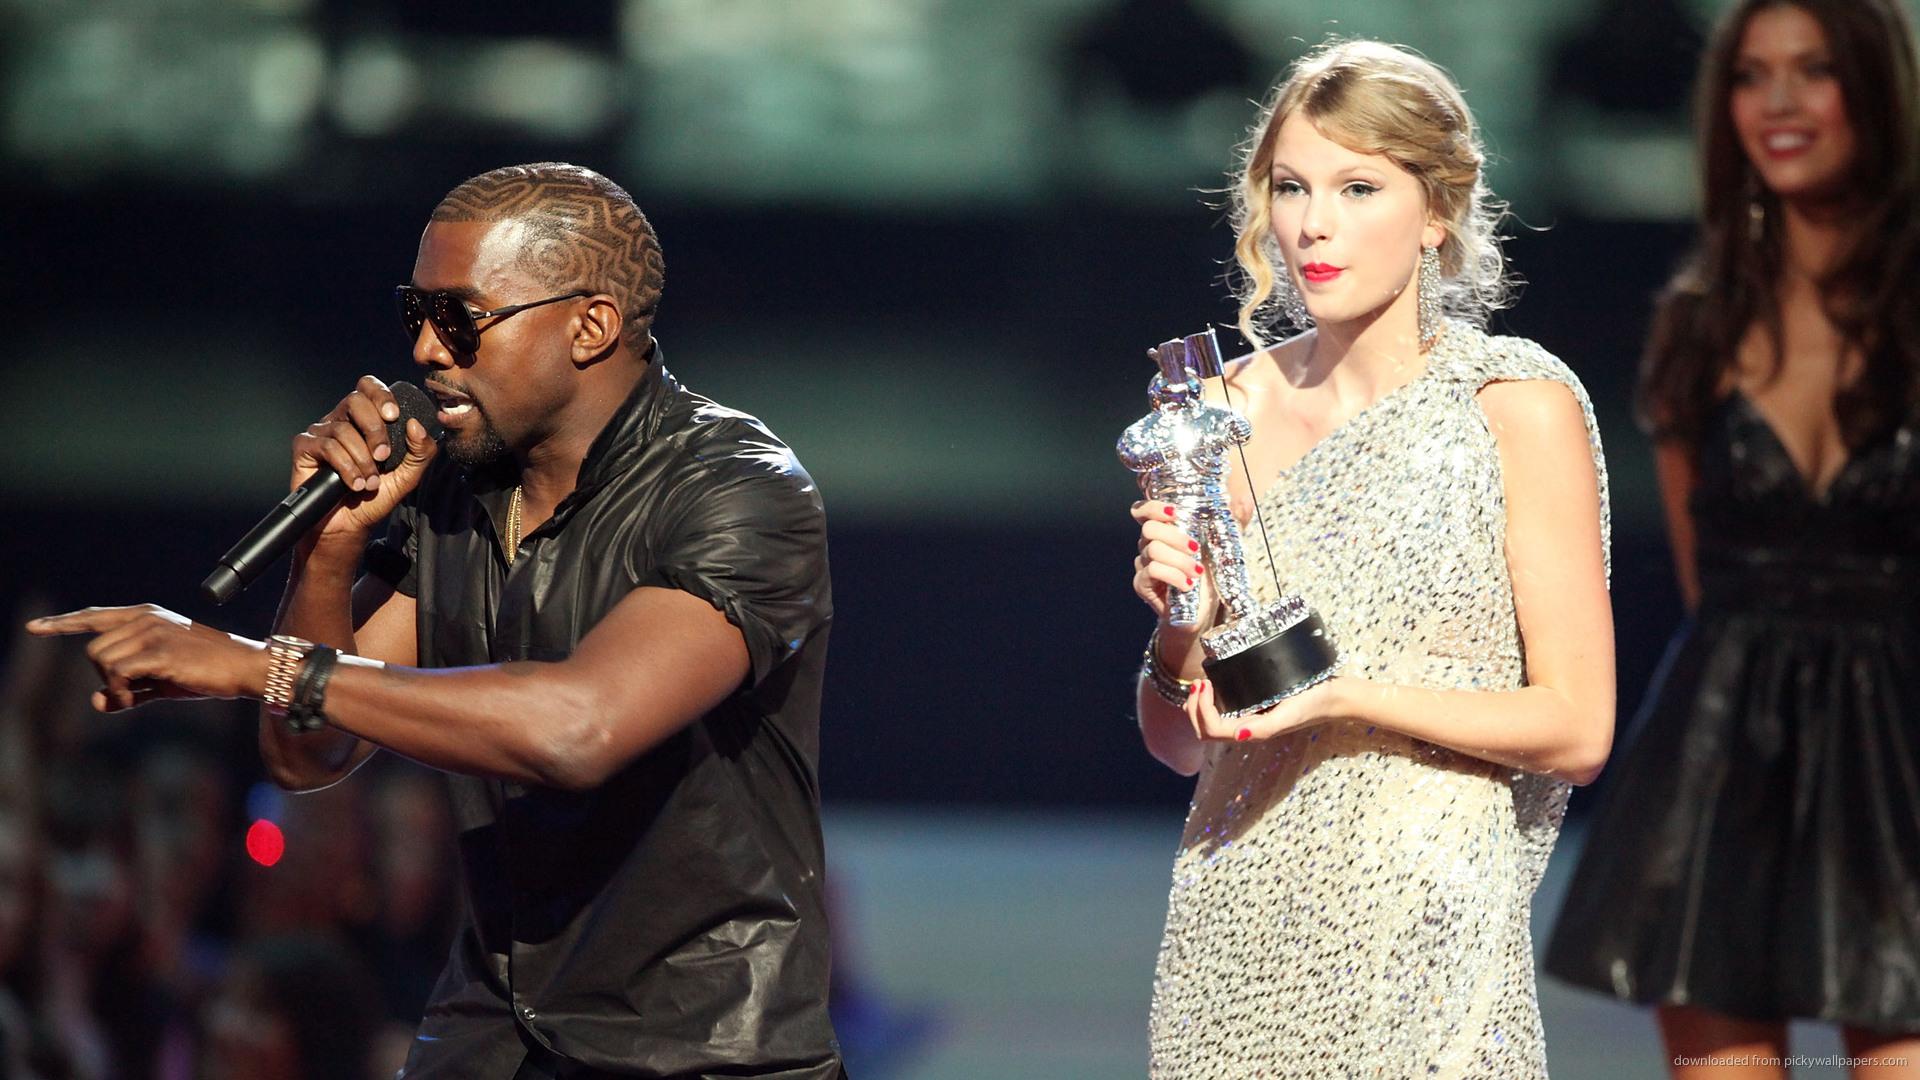 Taylor Swift Kanye West MTV Video Music Awards 2009